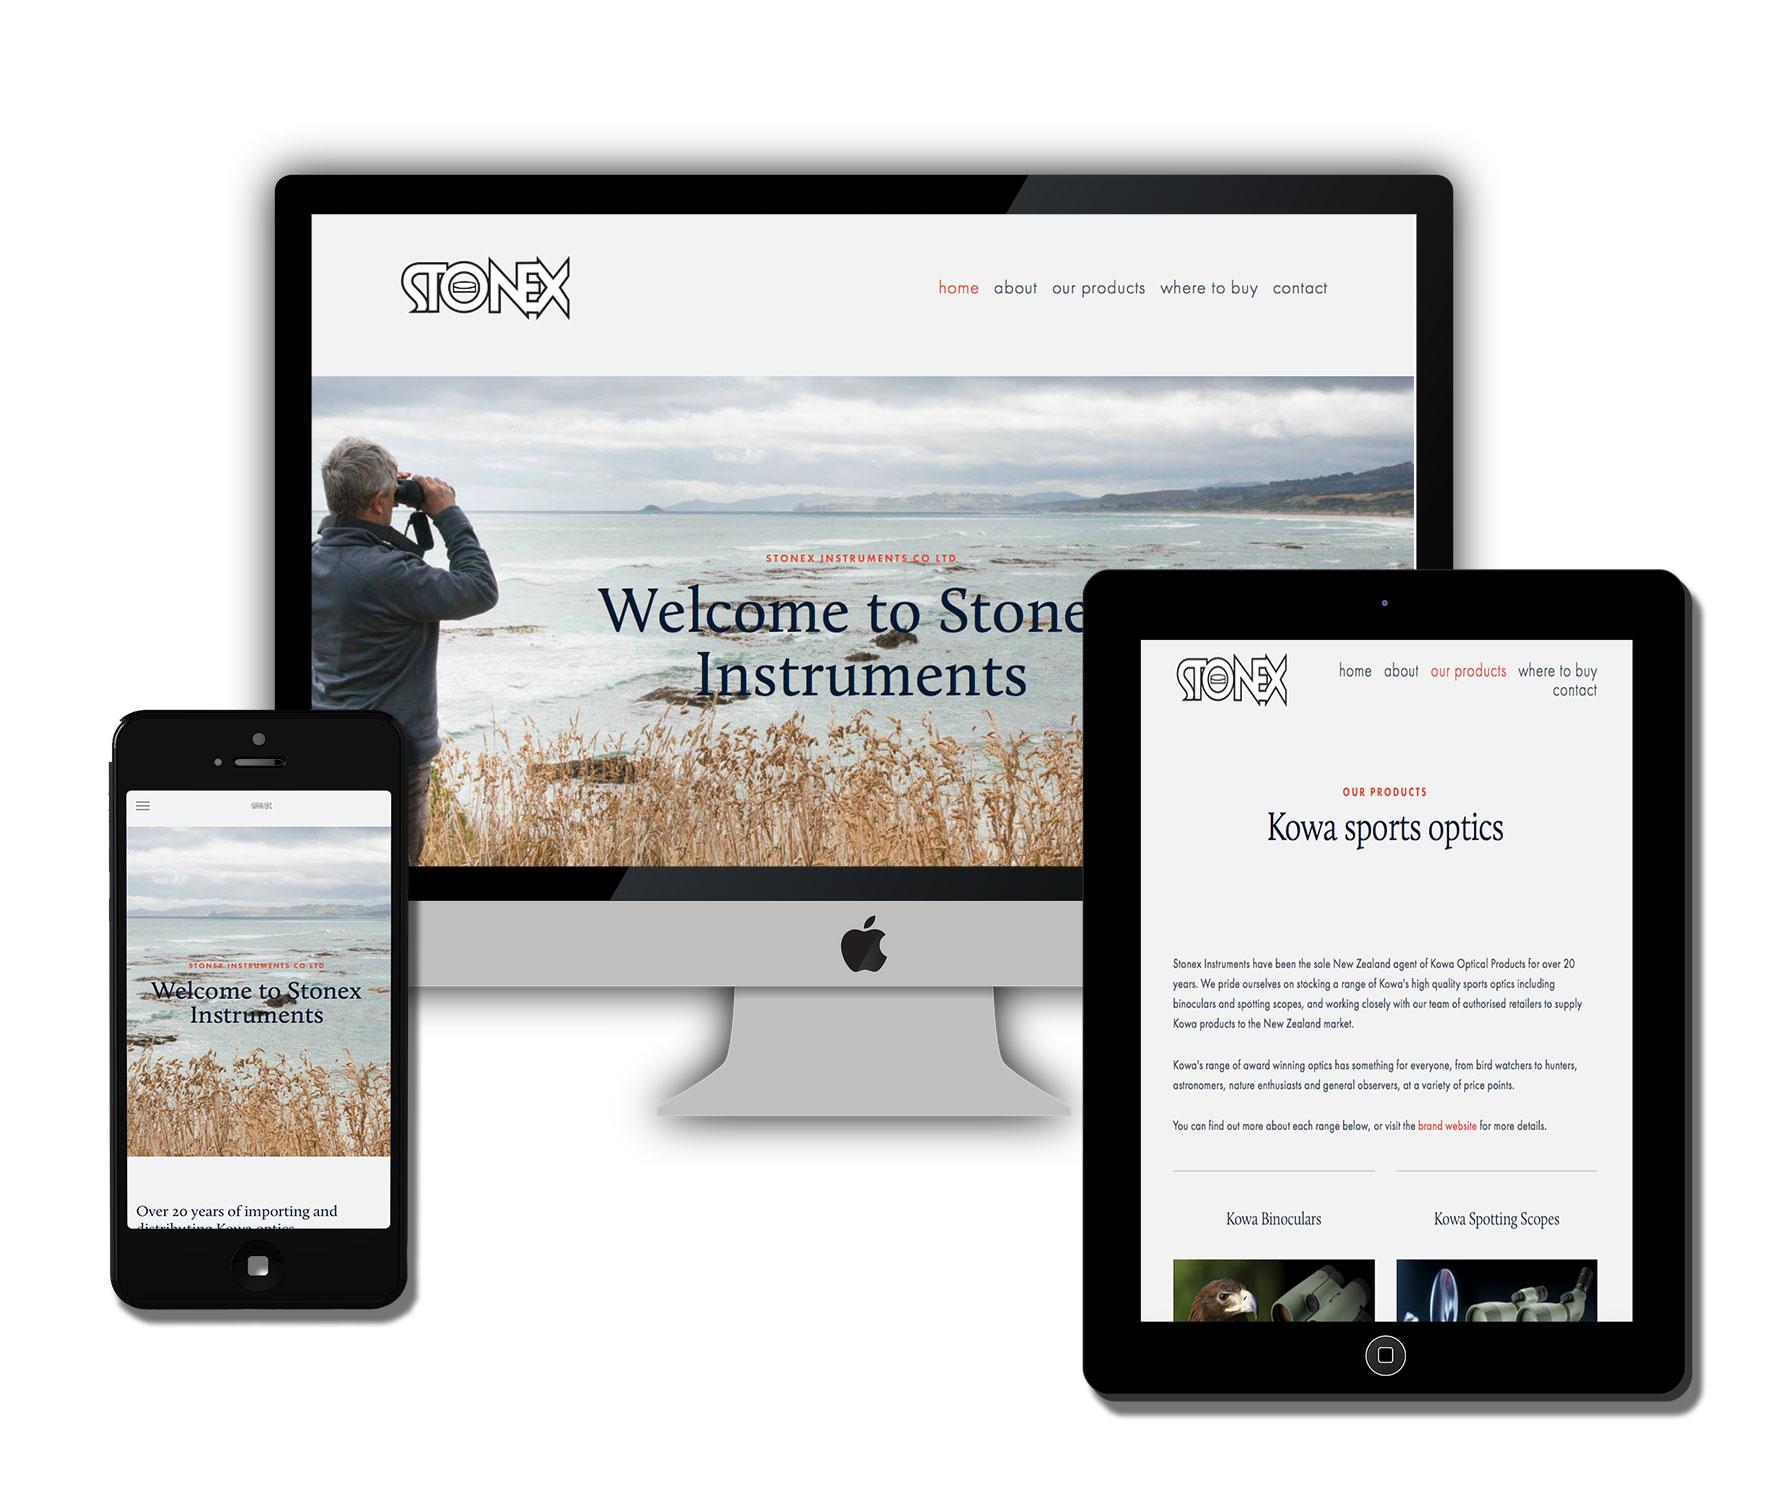 Stonex Instruments business website